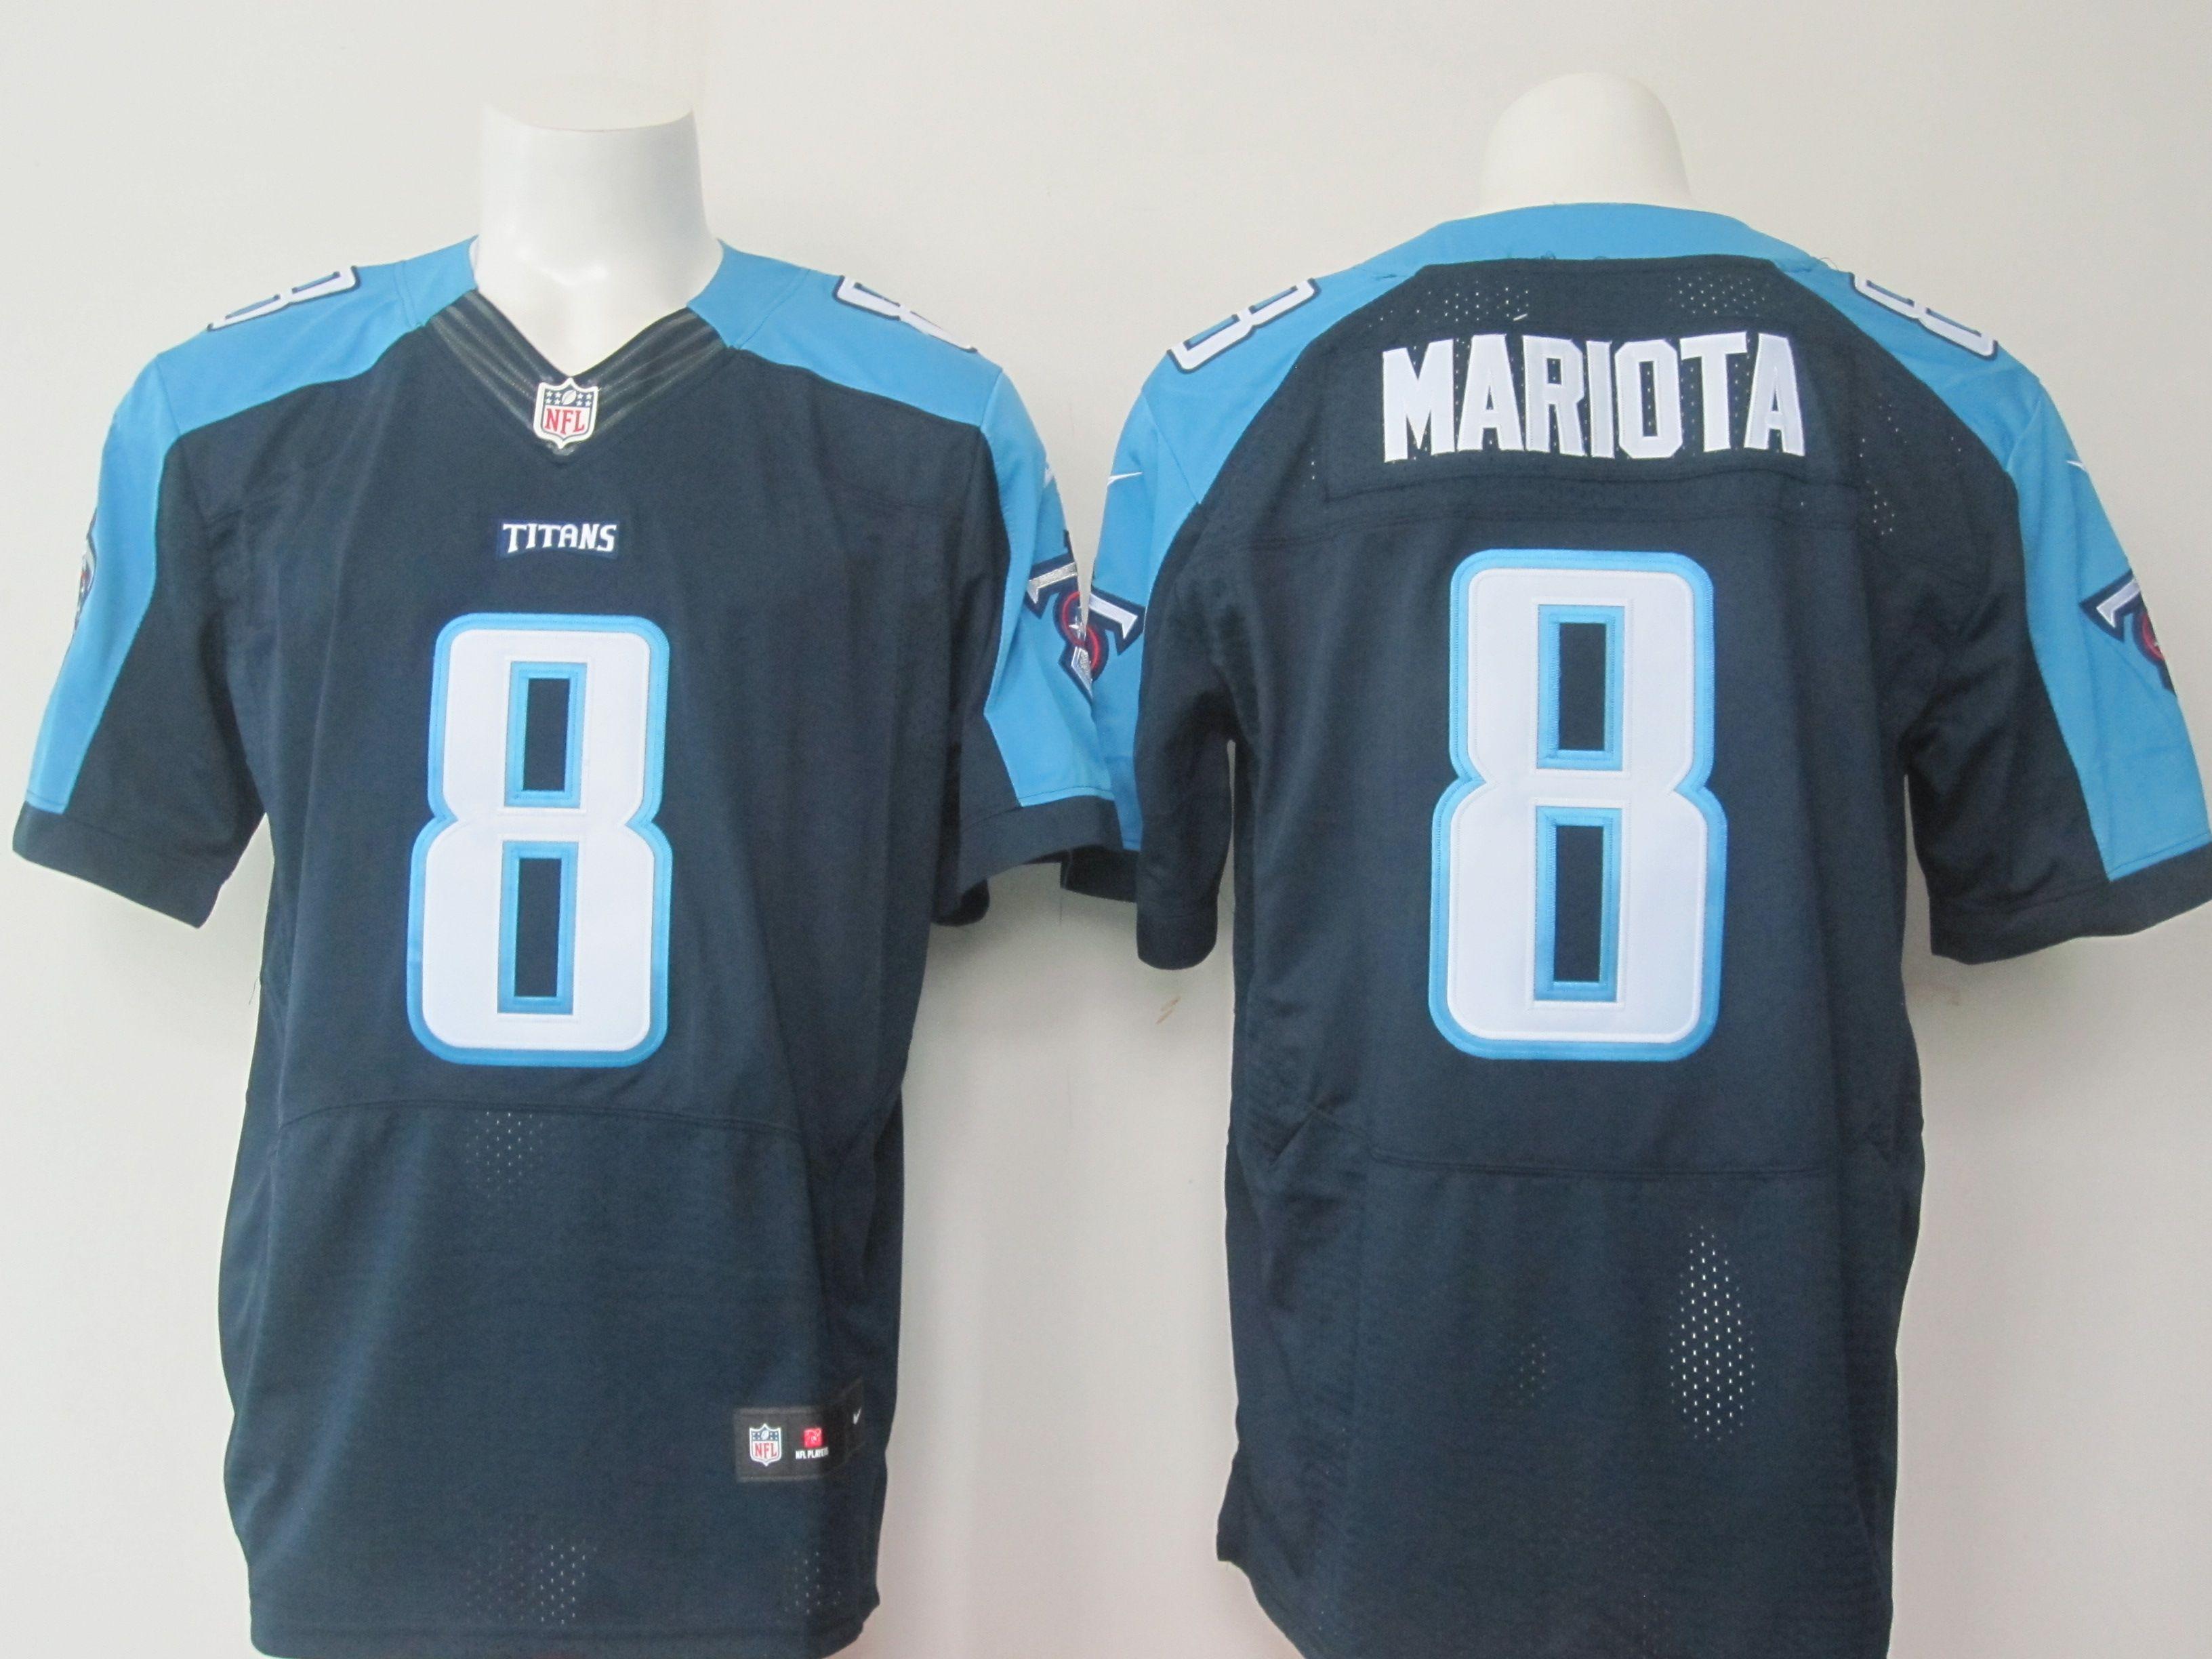 Nike Titans Marcus Mariota Navy Blue Alternate Men's Stitched NFL Elite  Jersey And Browns DeShone Kizer 7 jersey